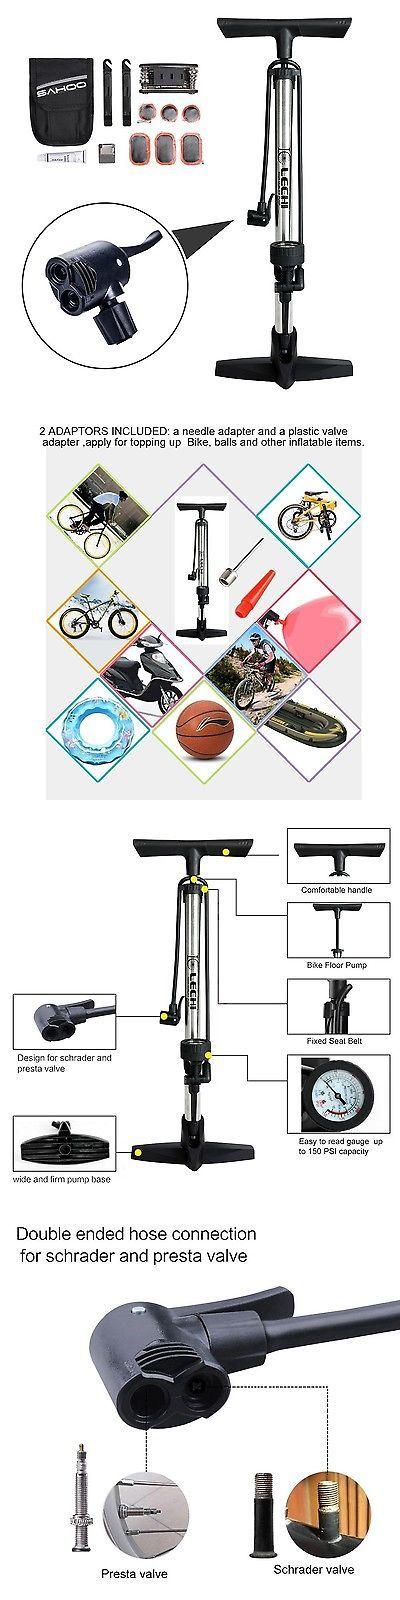 Pumps 22691: Anxinke High Performance Bike Floor Pump Bicycle Pump With Gauge Bicycle Tire... -> BUY IT NOW ONLY: $300 on eBay!